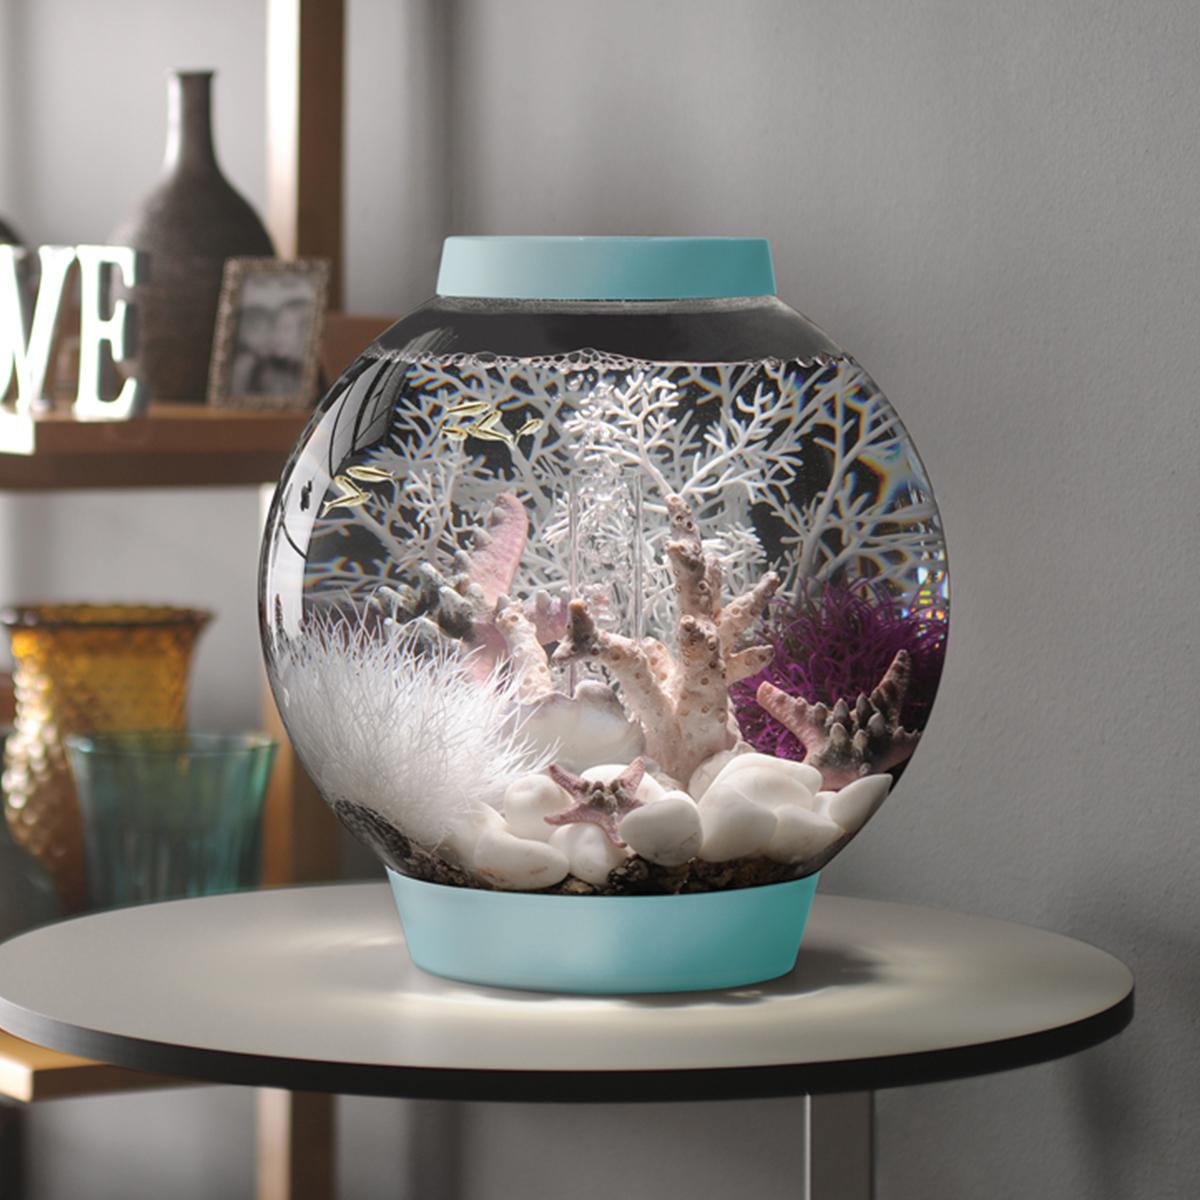 Cabinet aquarium fish tank tropical 60cm 2ft 100l - Baby Biorb 15 Litre Baby Blue Aquarium Led Lighting Acrylic Fish Tank Bowl Setup